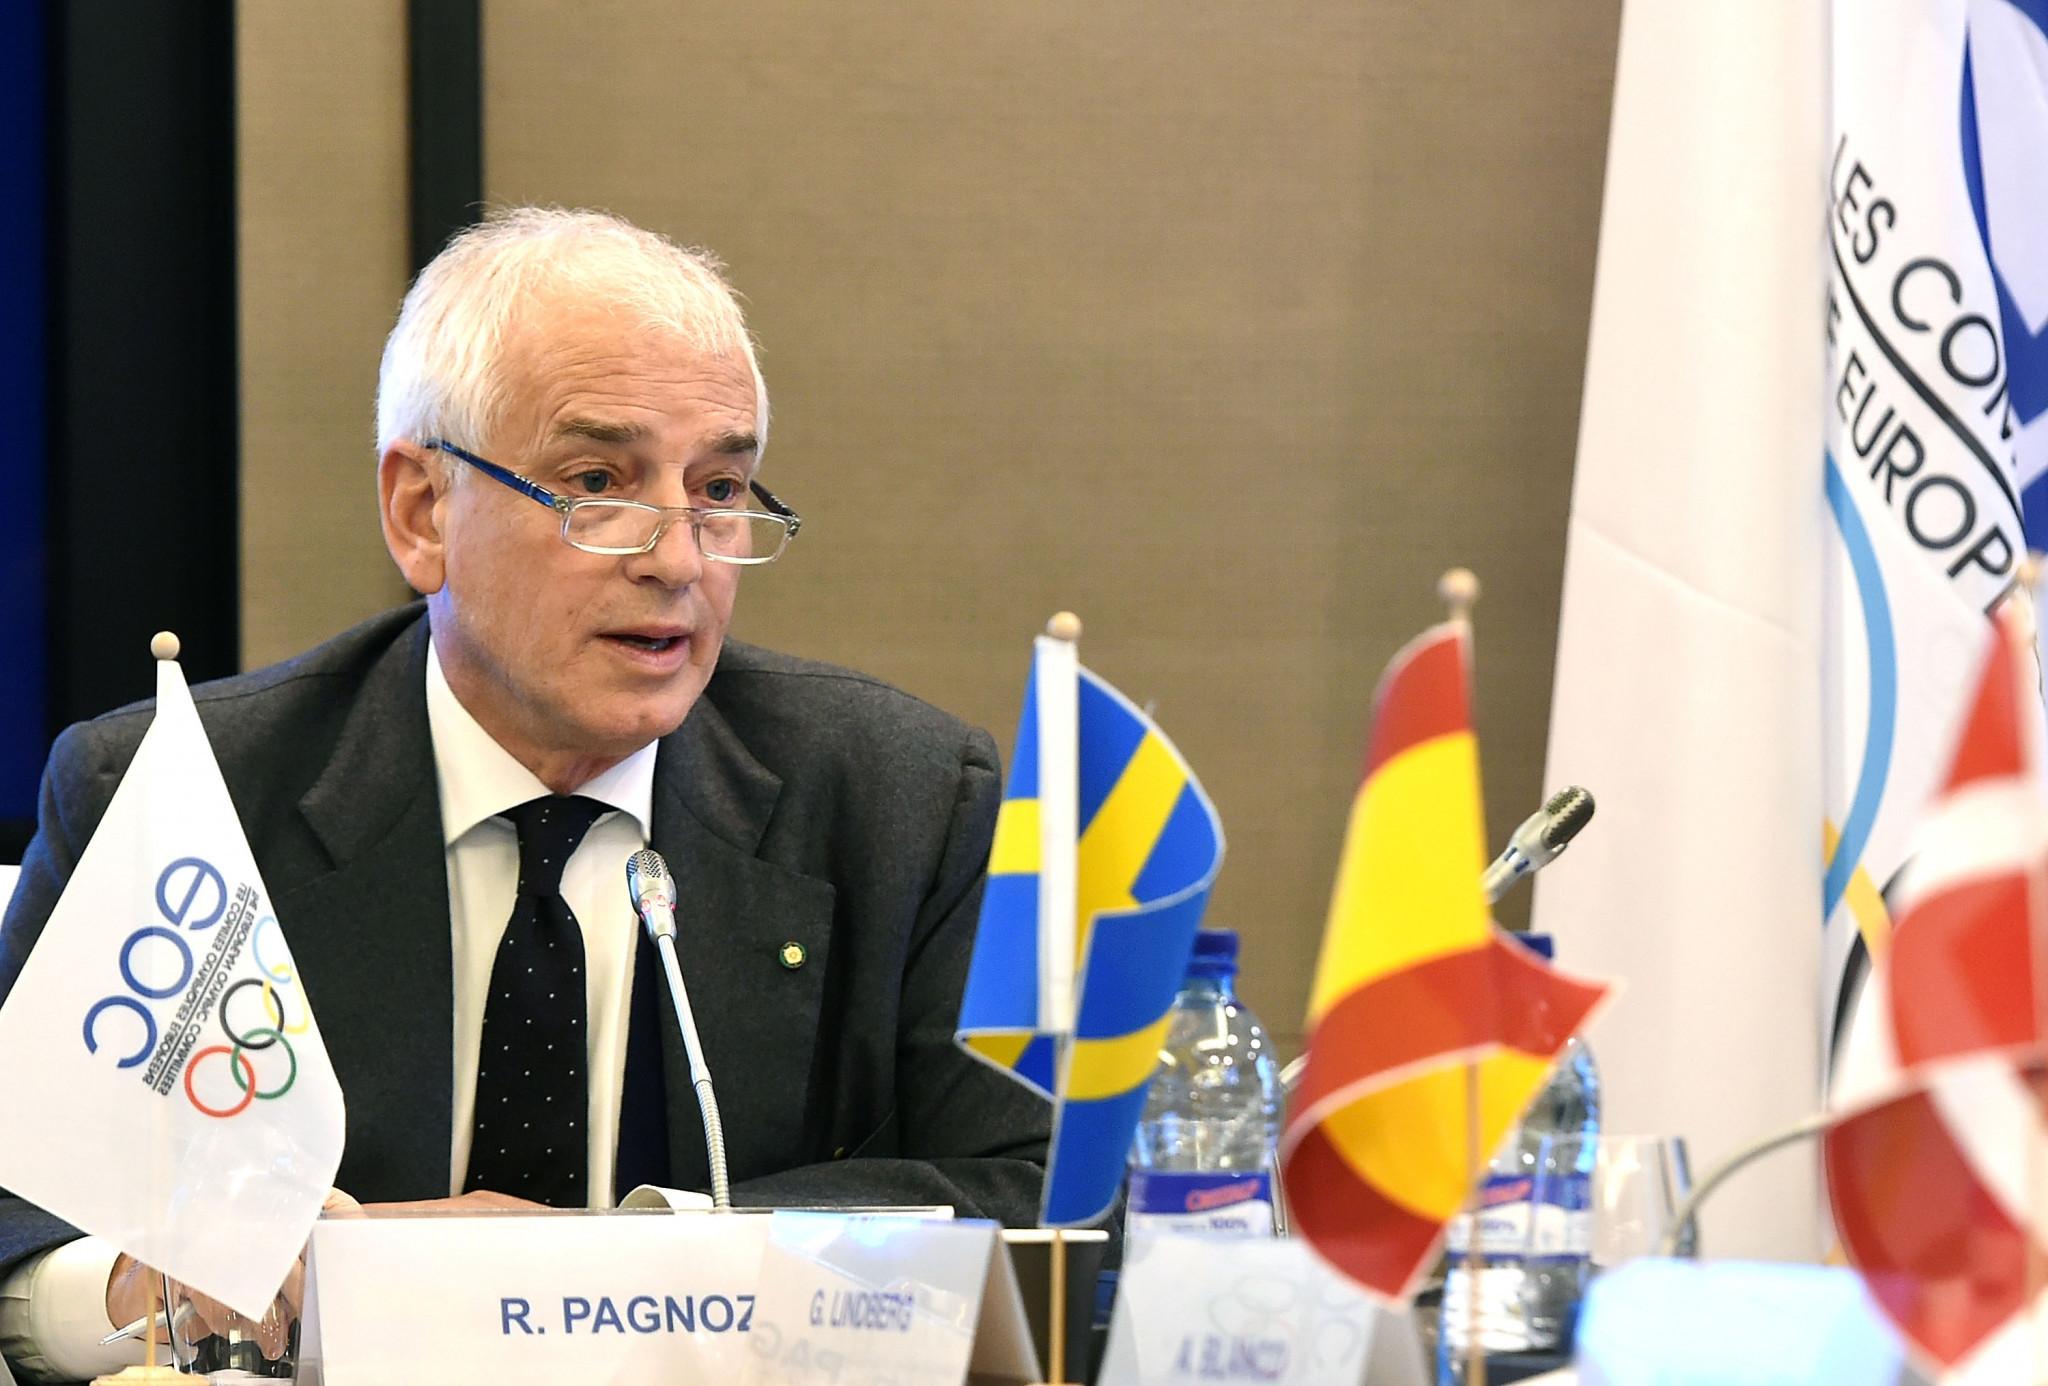 EOC secretary general Pagnozzi receives top honour in Italian sport